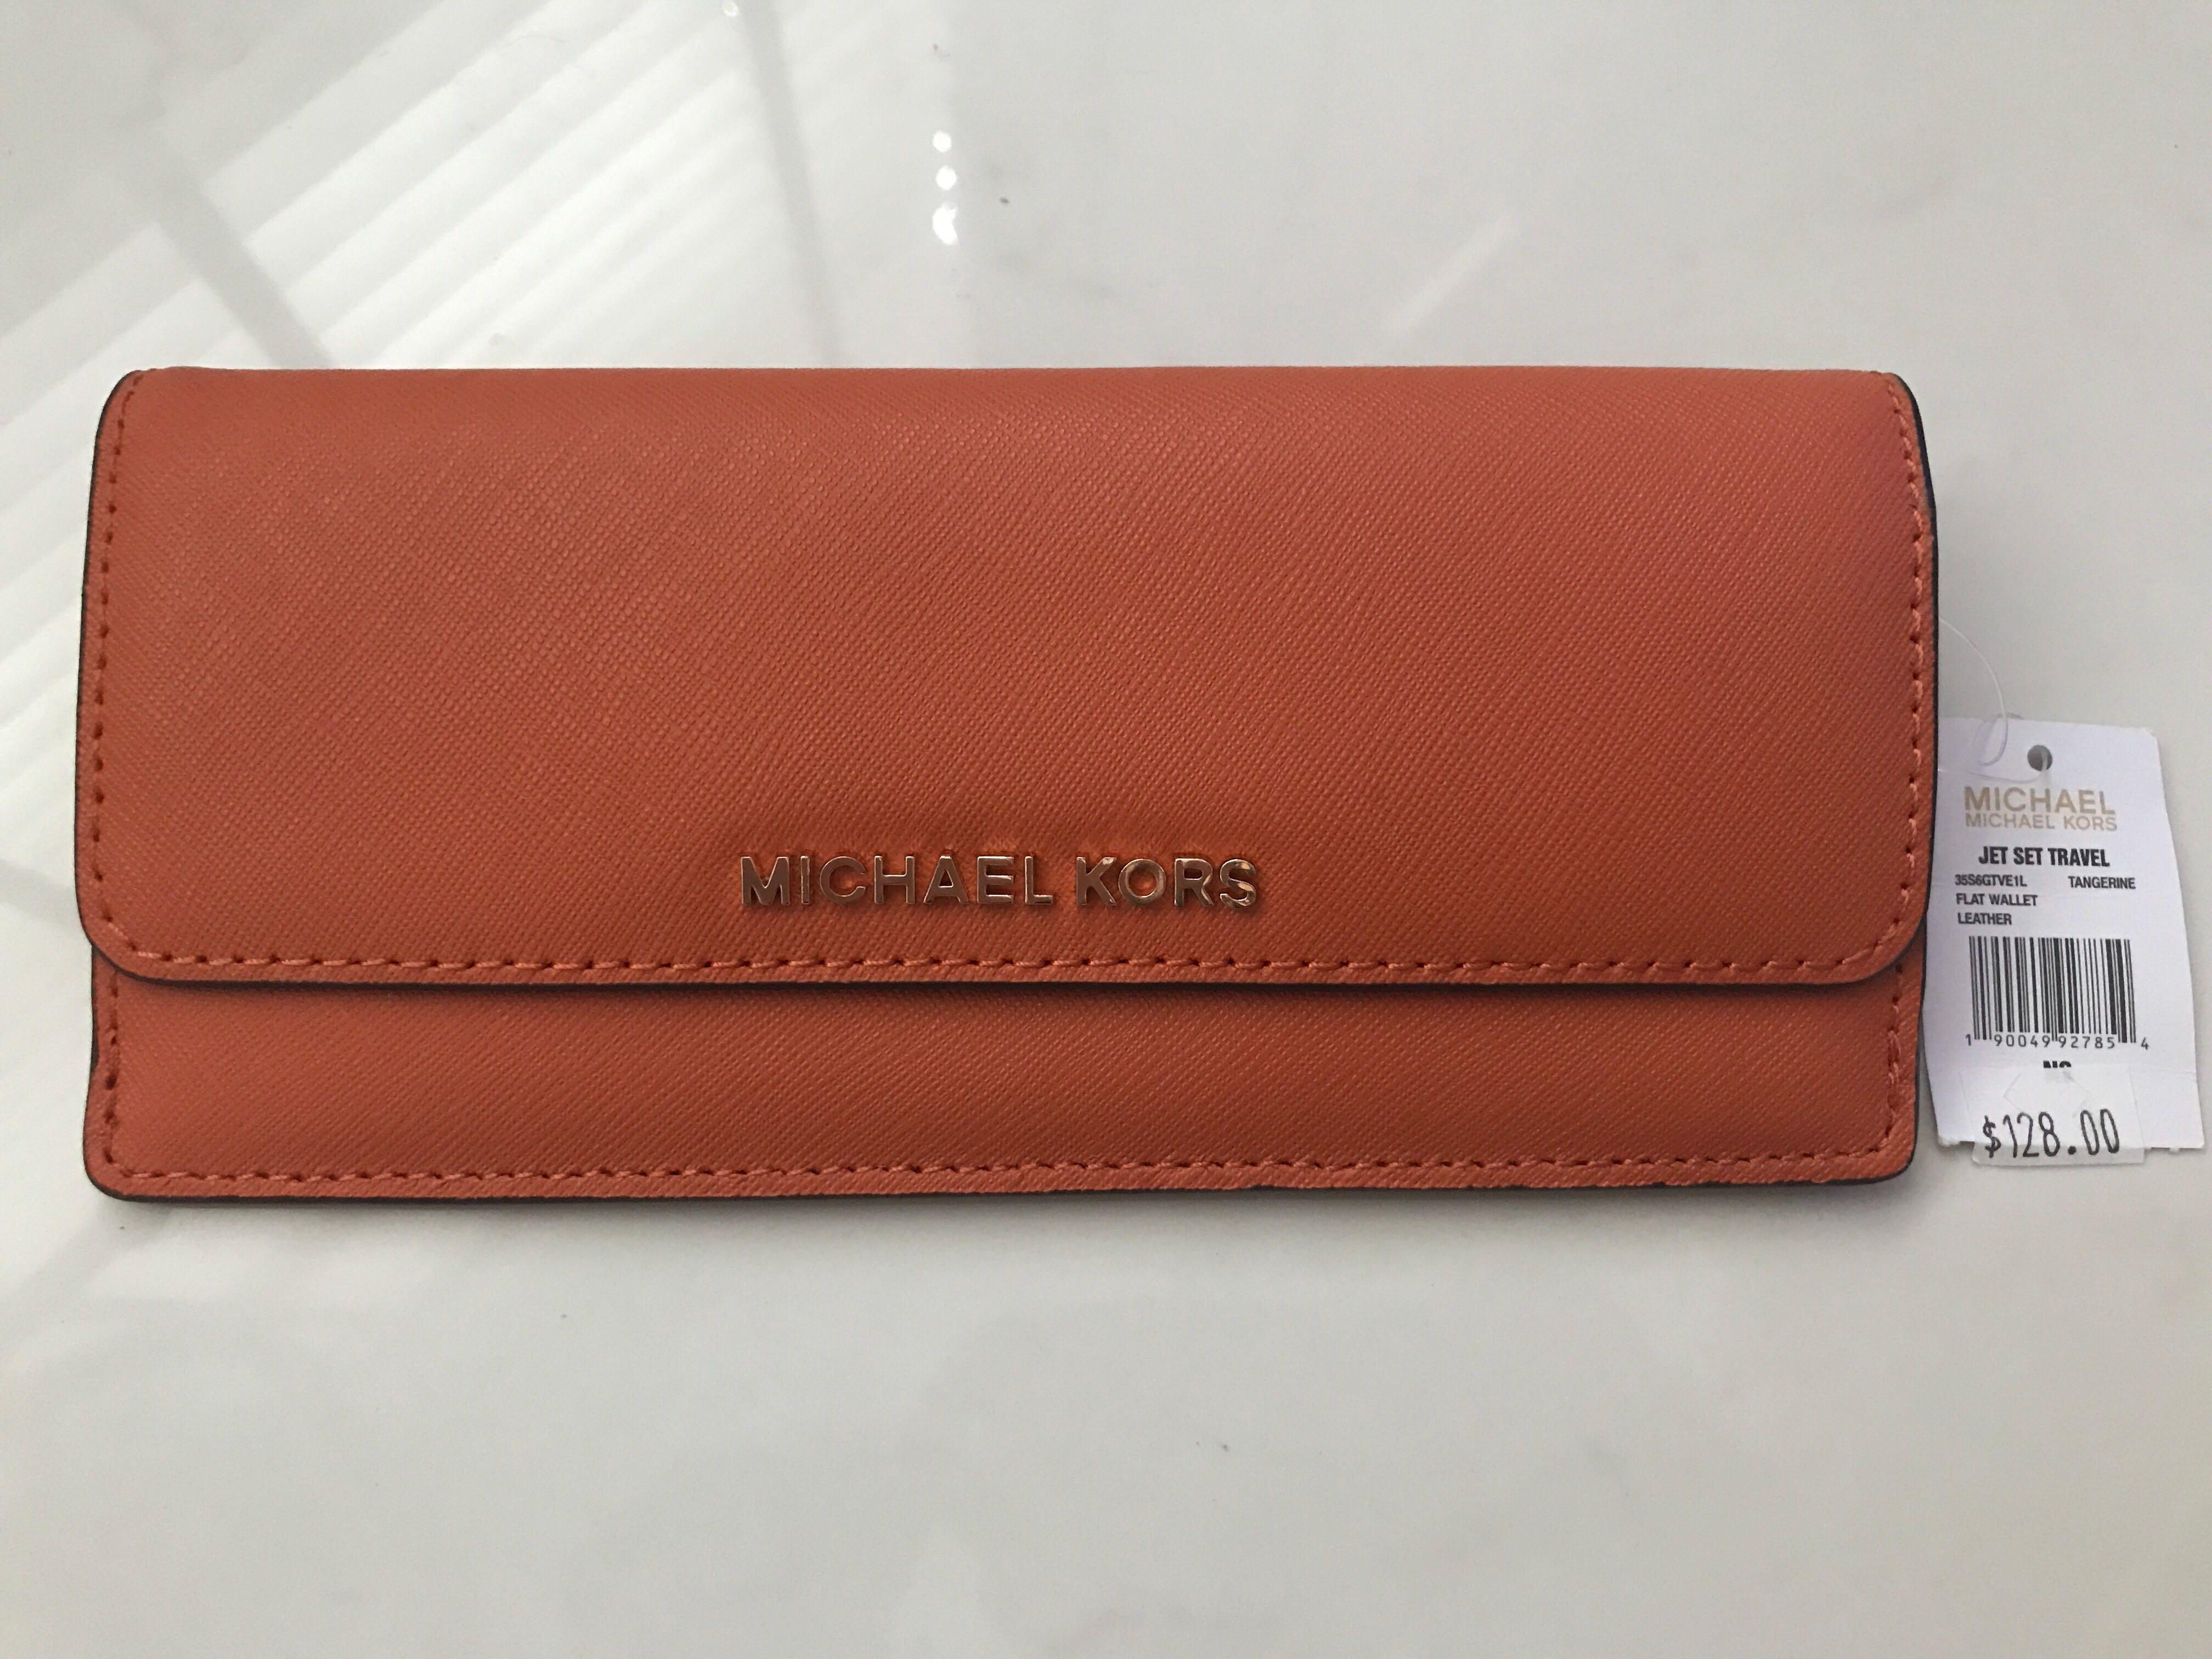 74116e93dbd3 Michael Kors Jet Set Travel Flat Wallet, Women's Fashion, Bags & Wallets,  Wallets on Carousell